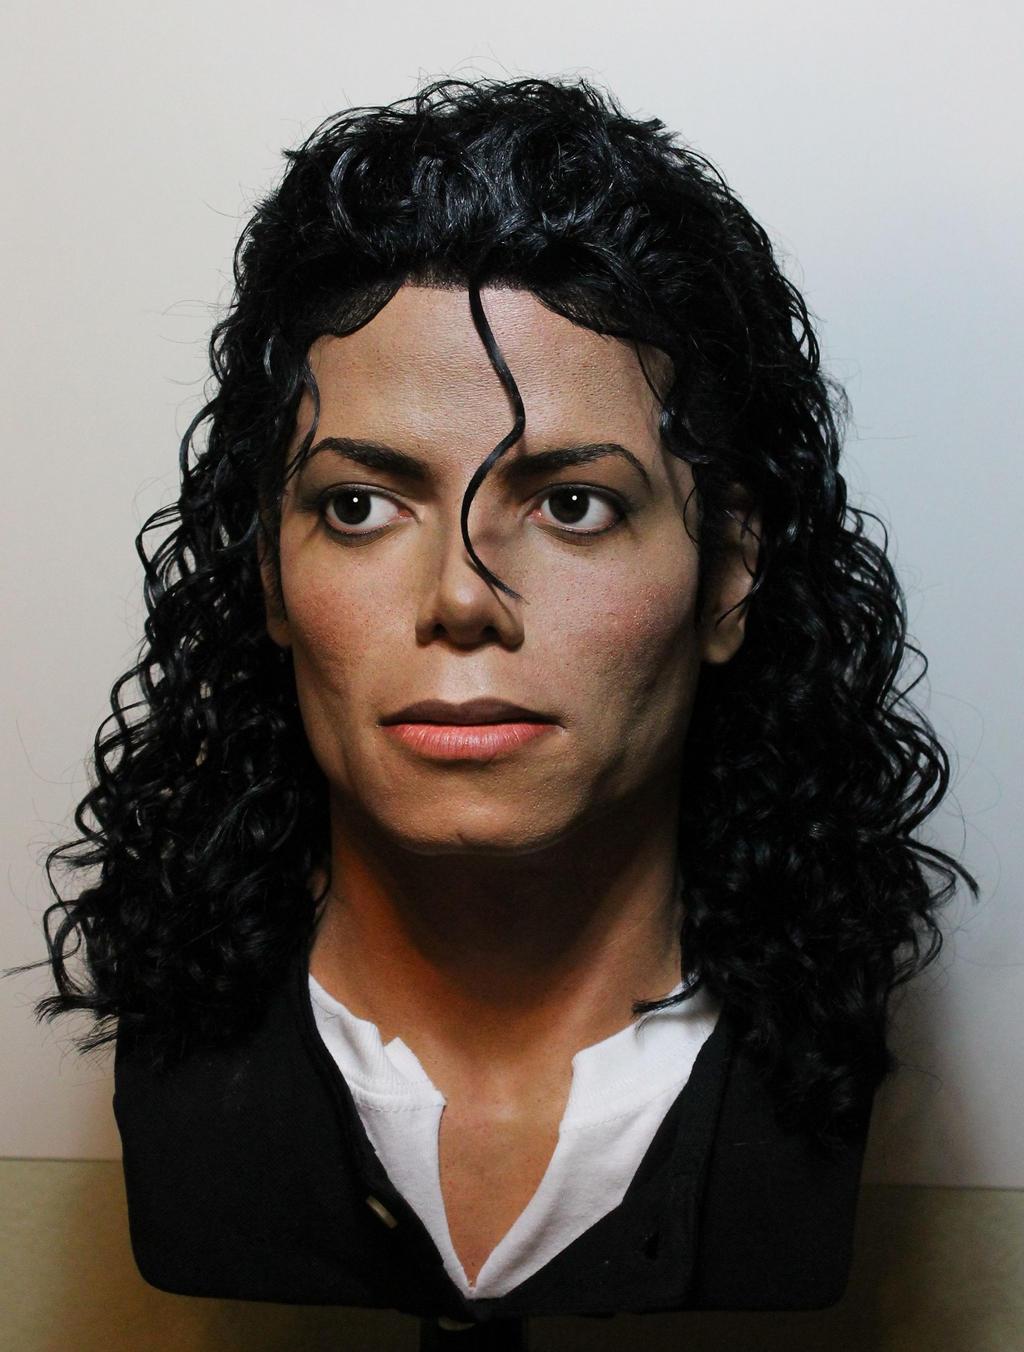 Busti raffiguranti Michael Jackson quasi alla perfezione Michael_jackson_lifesize_bad_era_moonwalker_bust_2_by_godaiking-d81ecra